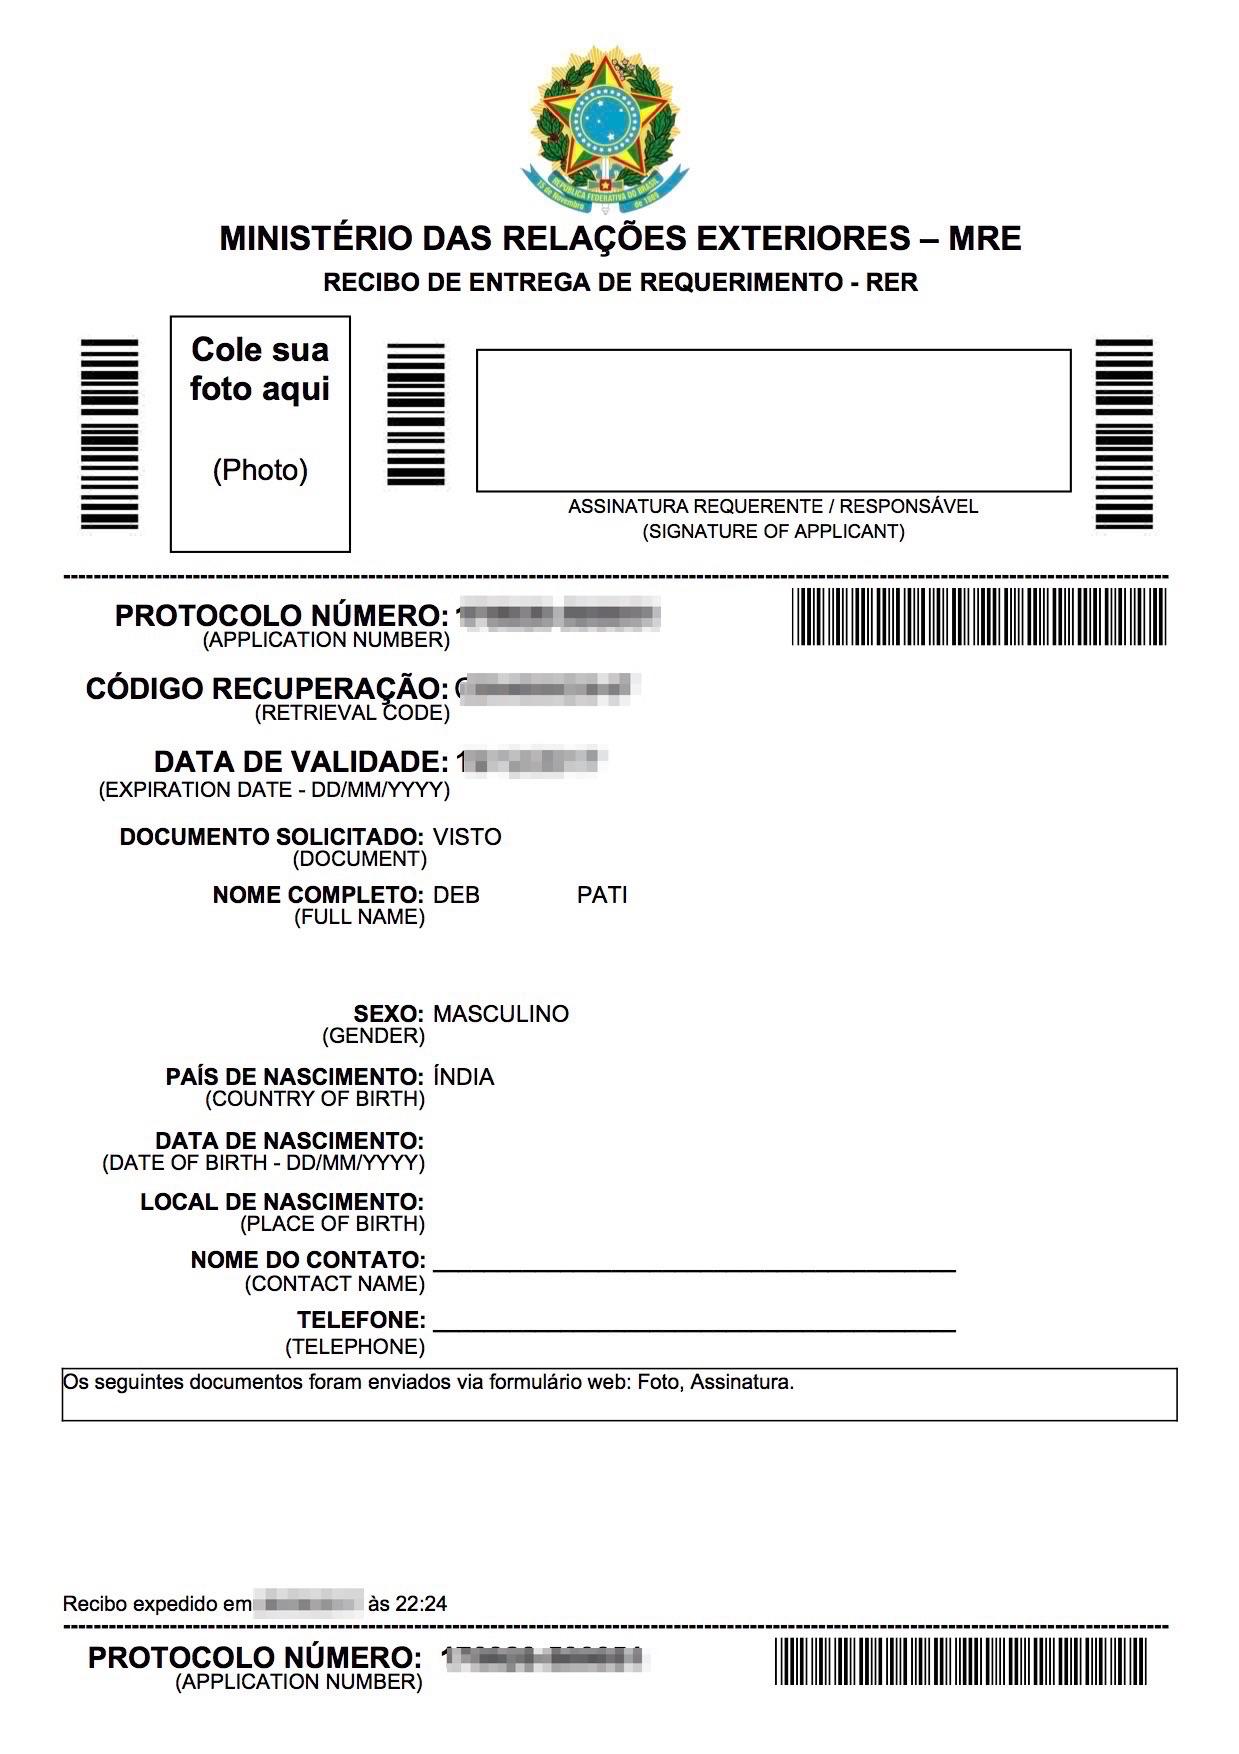 Brazil Visa application receipt